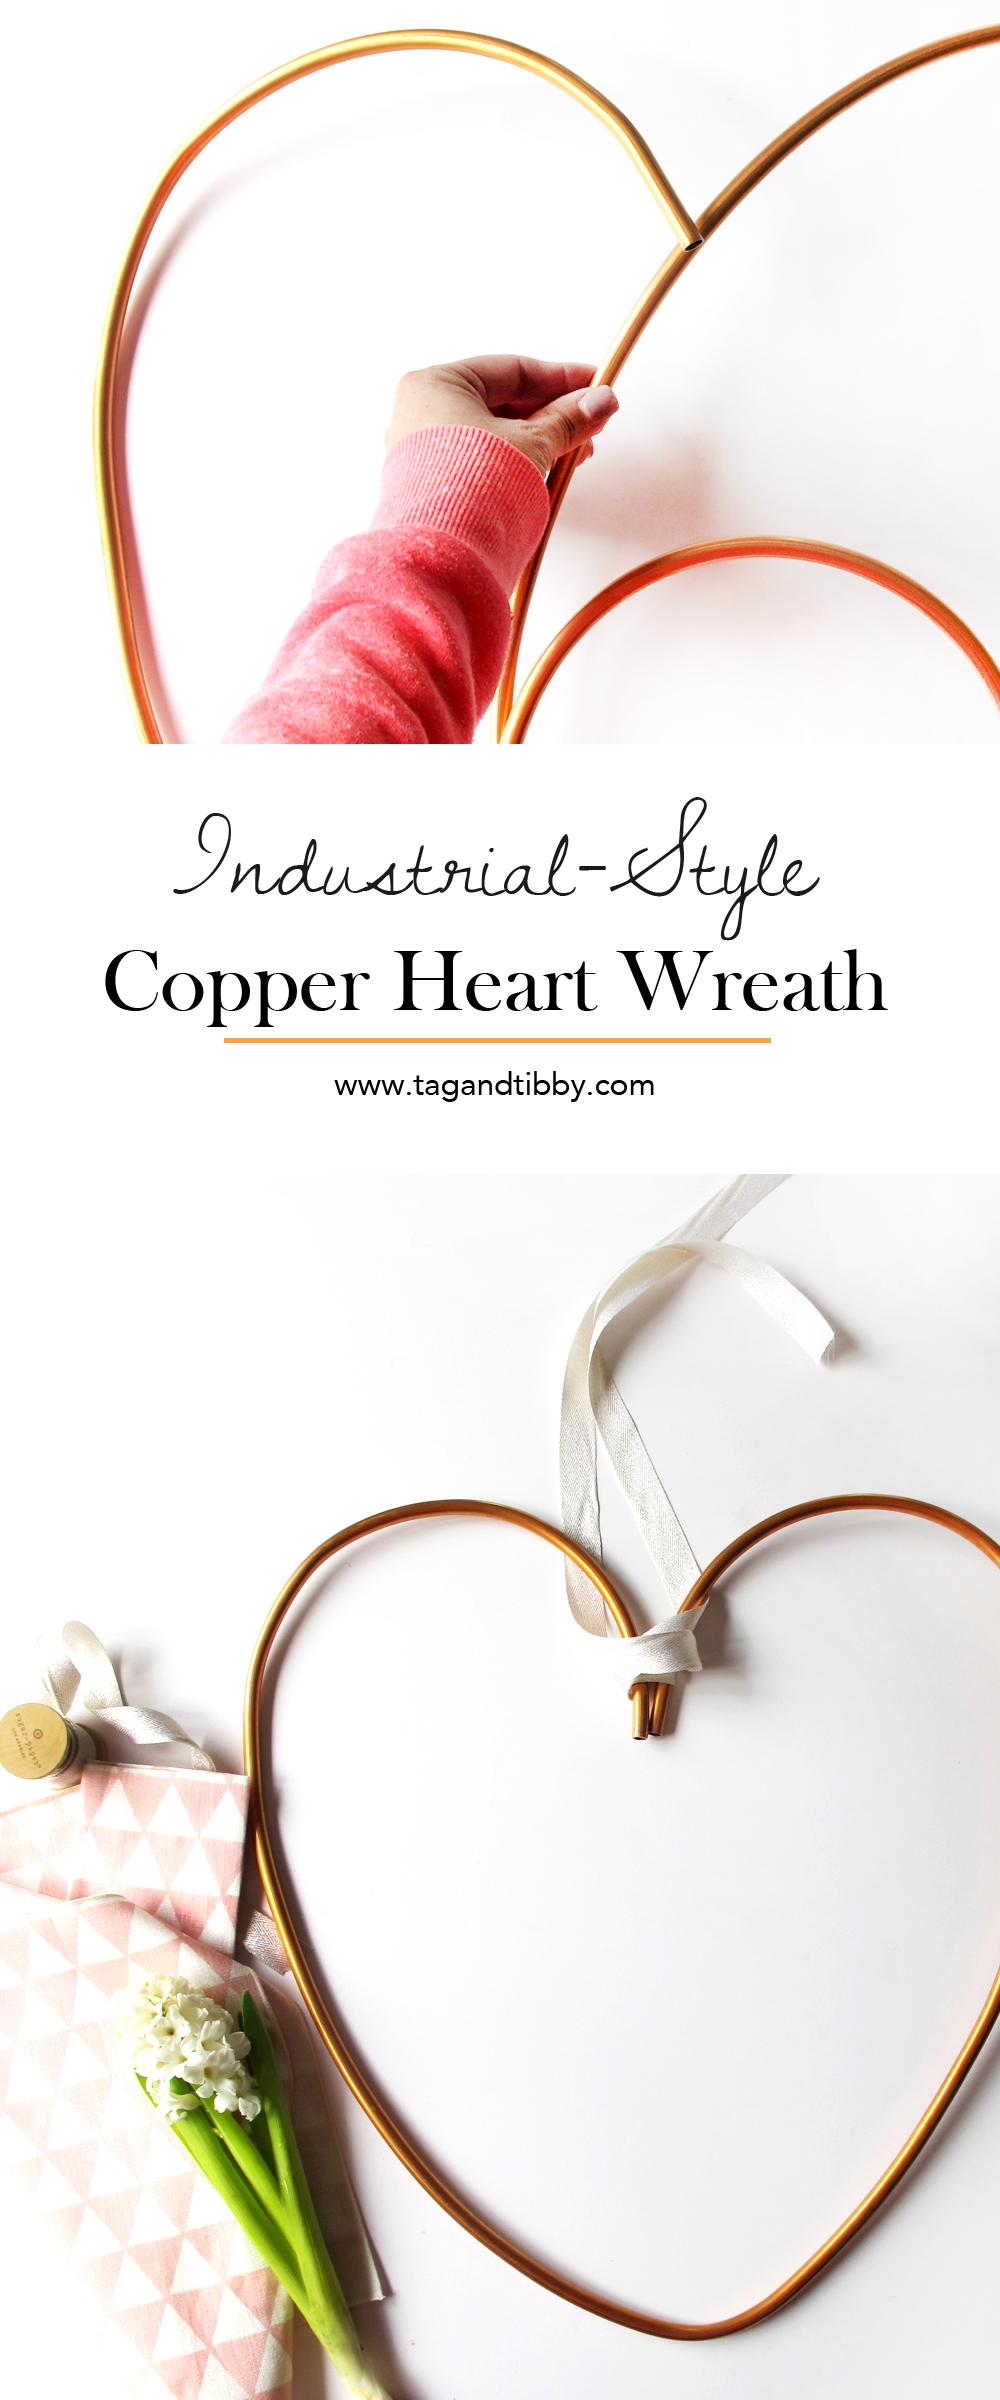 Industrial Style Copper Heart Wreath tutorial #ValentinesDayDIY